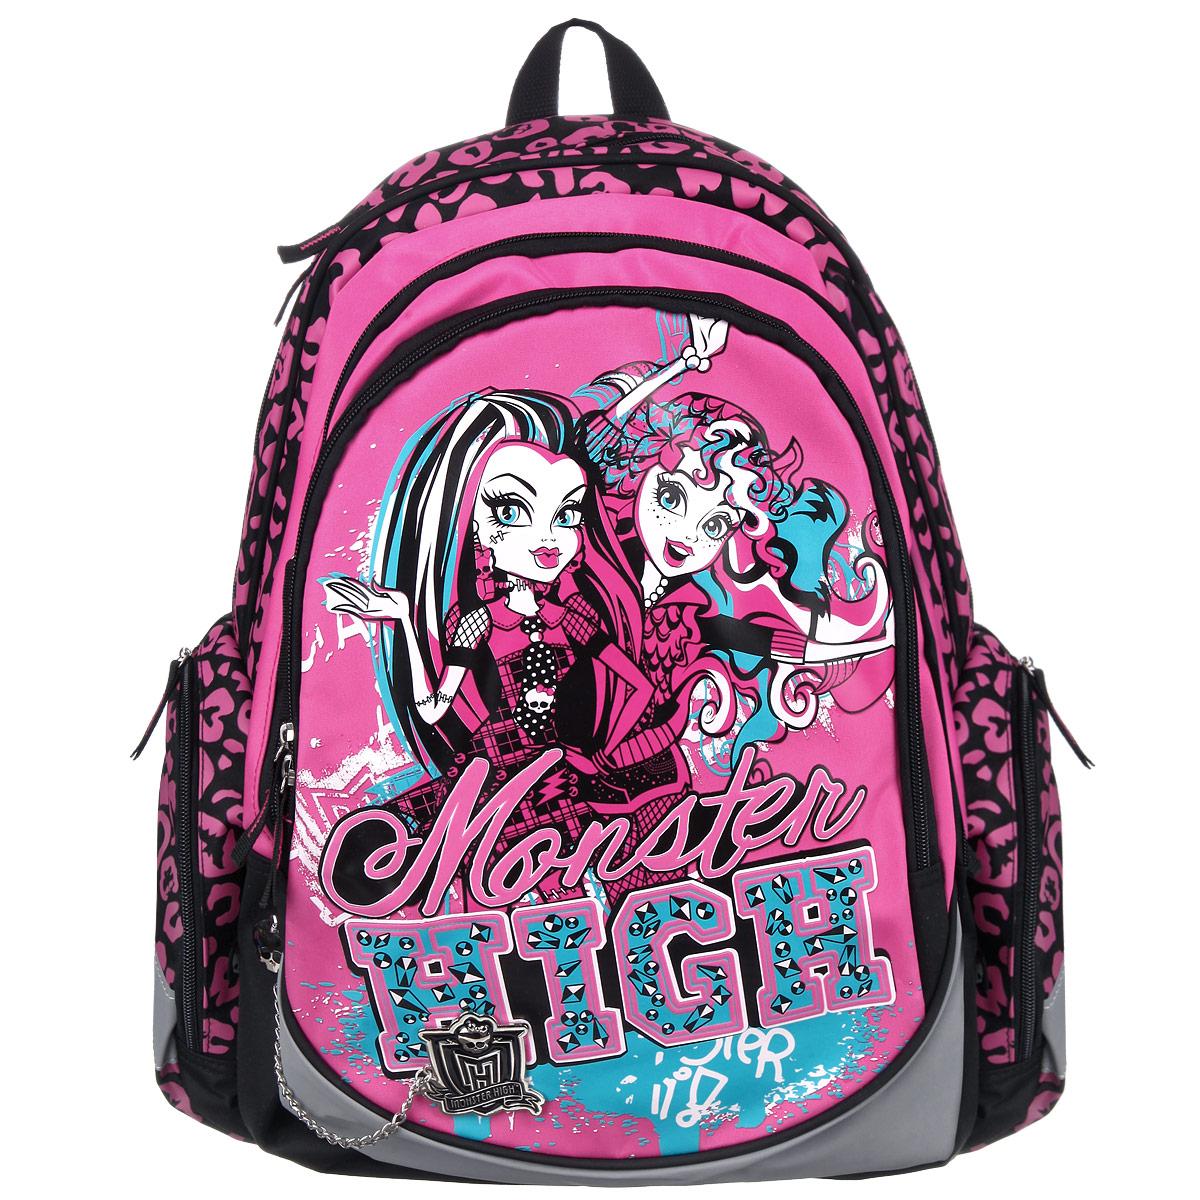 "Фото Рюкзак школьный ""Monster High"", цвет: розовый, черный, серый. MHBB-RT2-976"